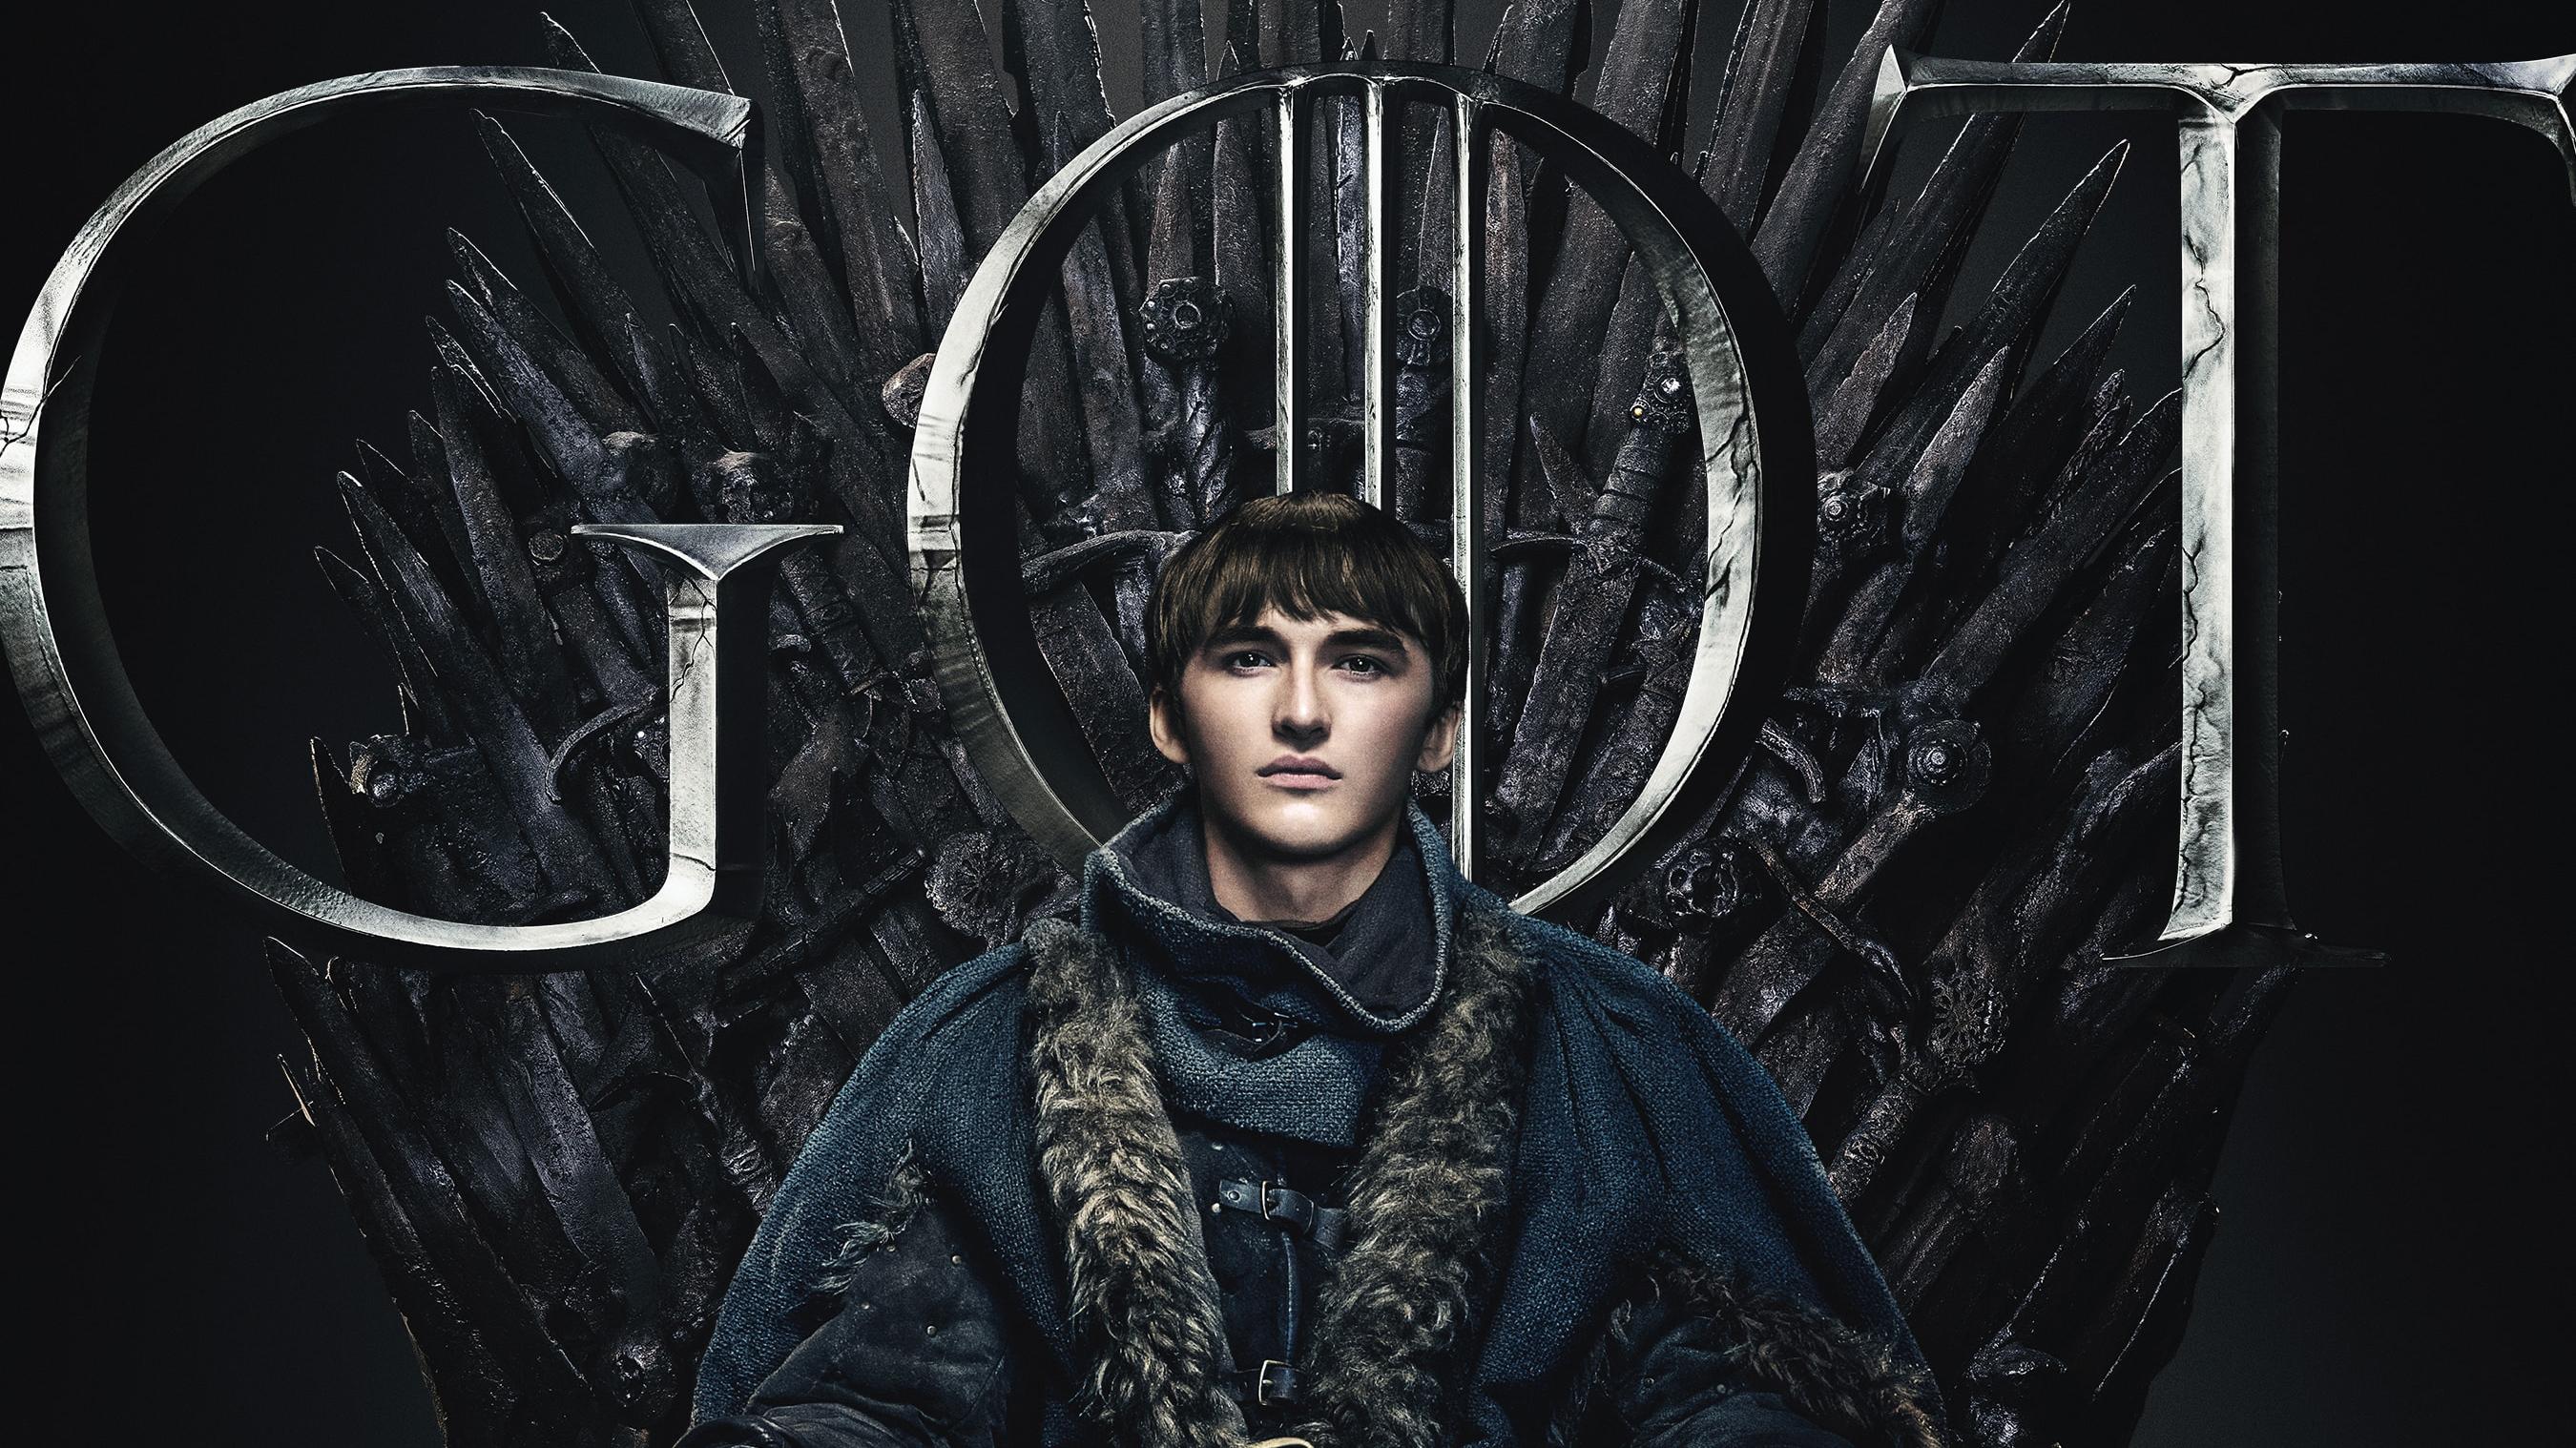 Bran Stark Game Of Thrones Season 8 Poster, HD Tv Shows